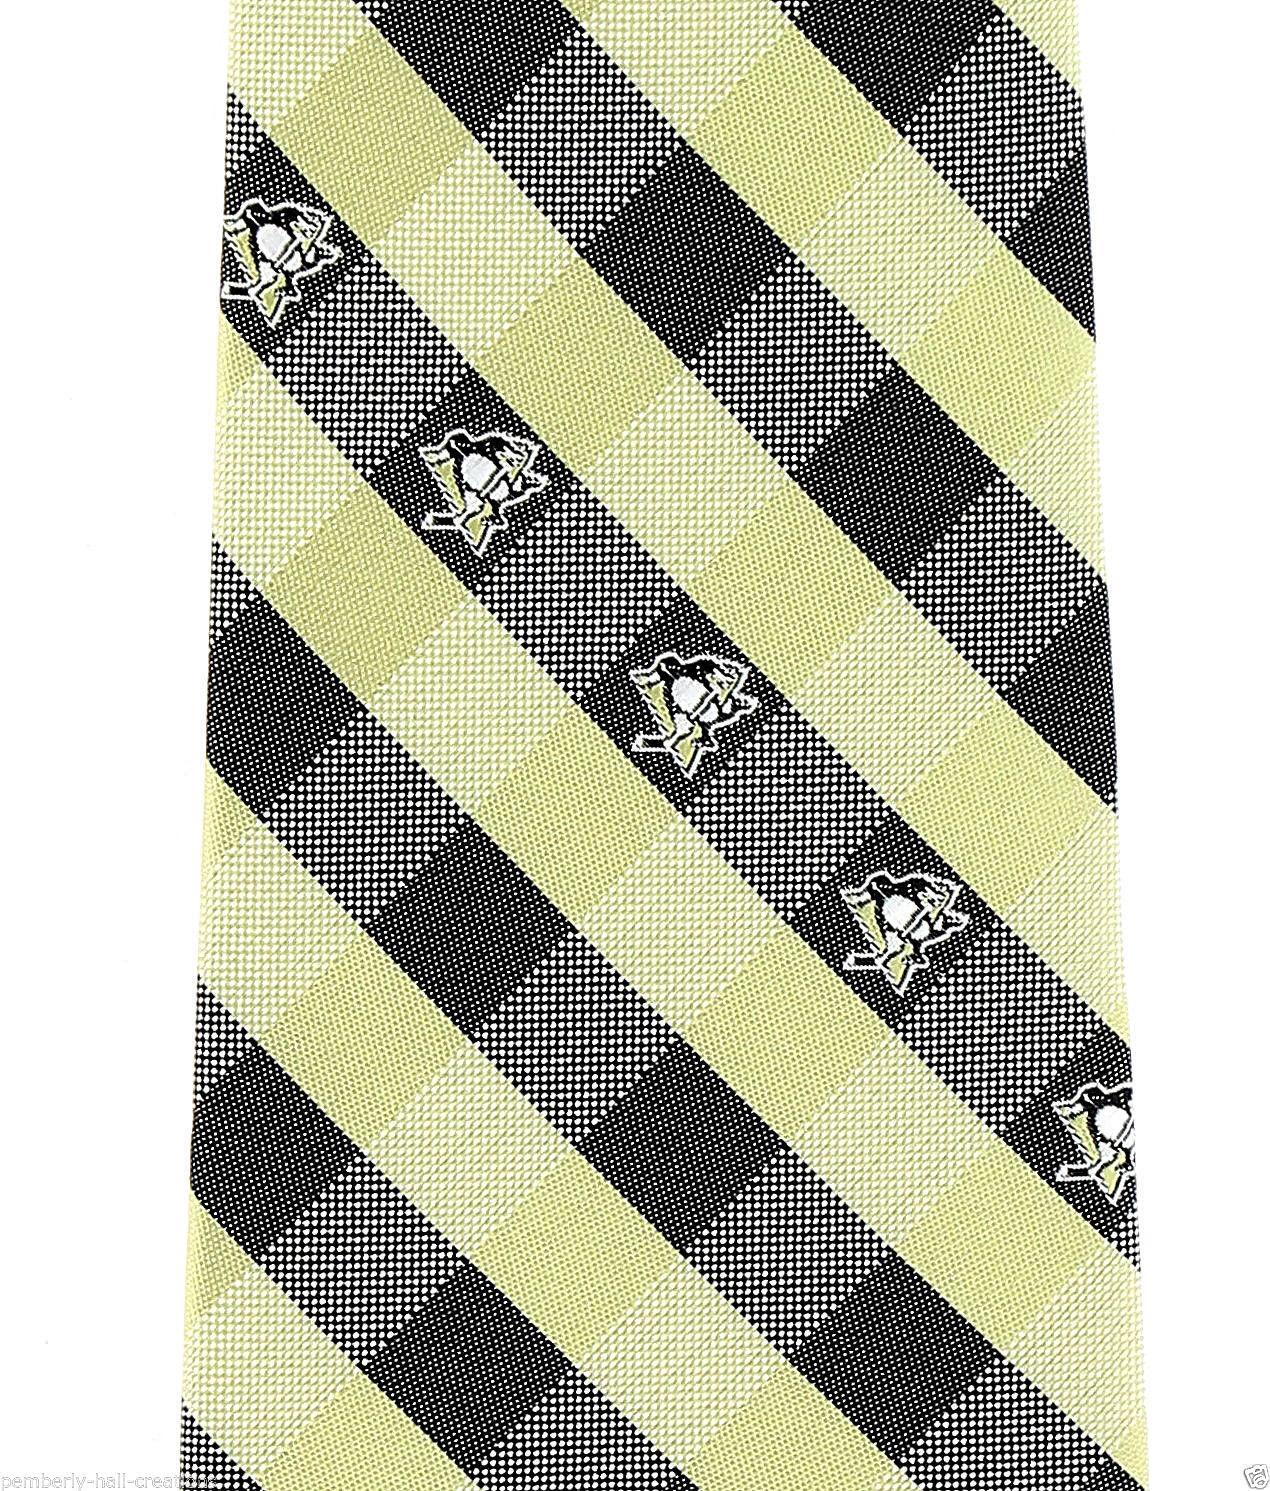 Pittsburgh Penguins Men's Necktie Licensed NHL Ice Hockey Checks Black Neck Tie image 2